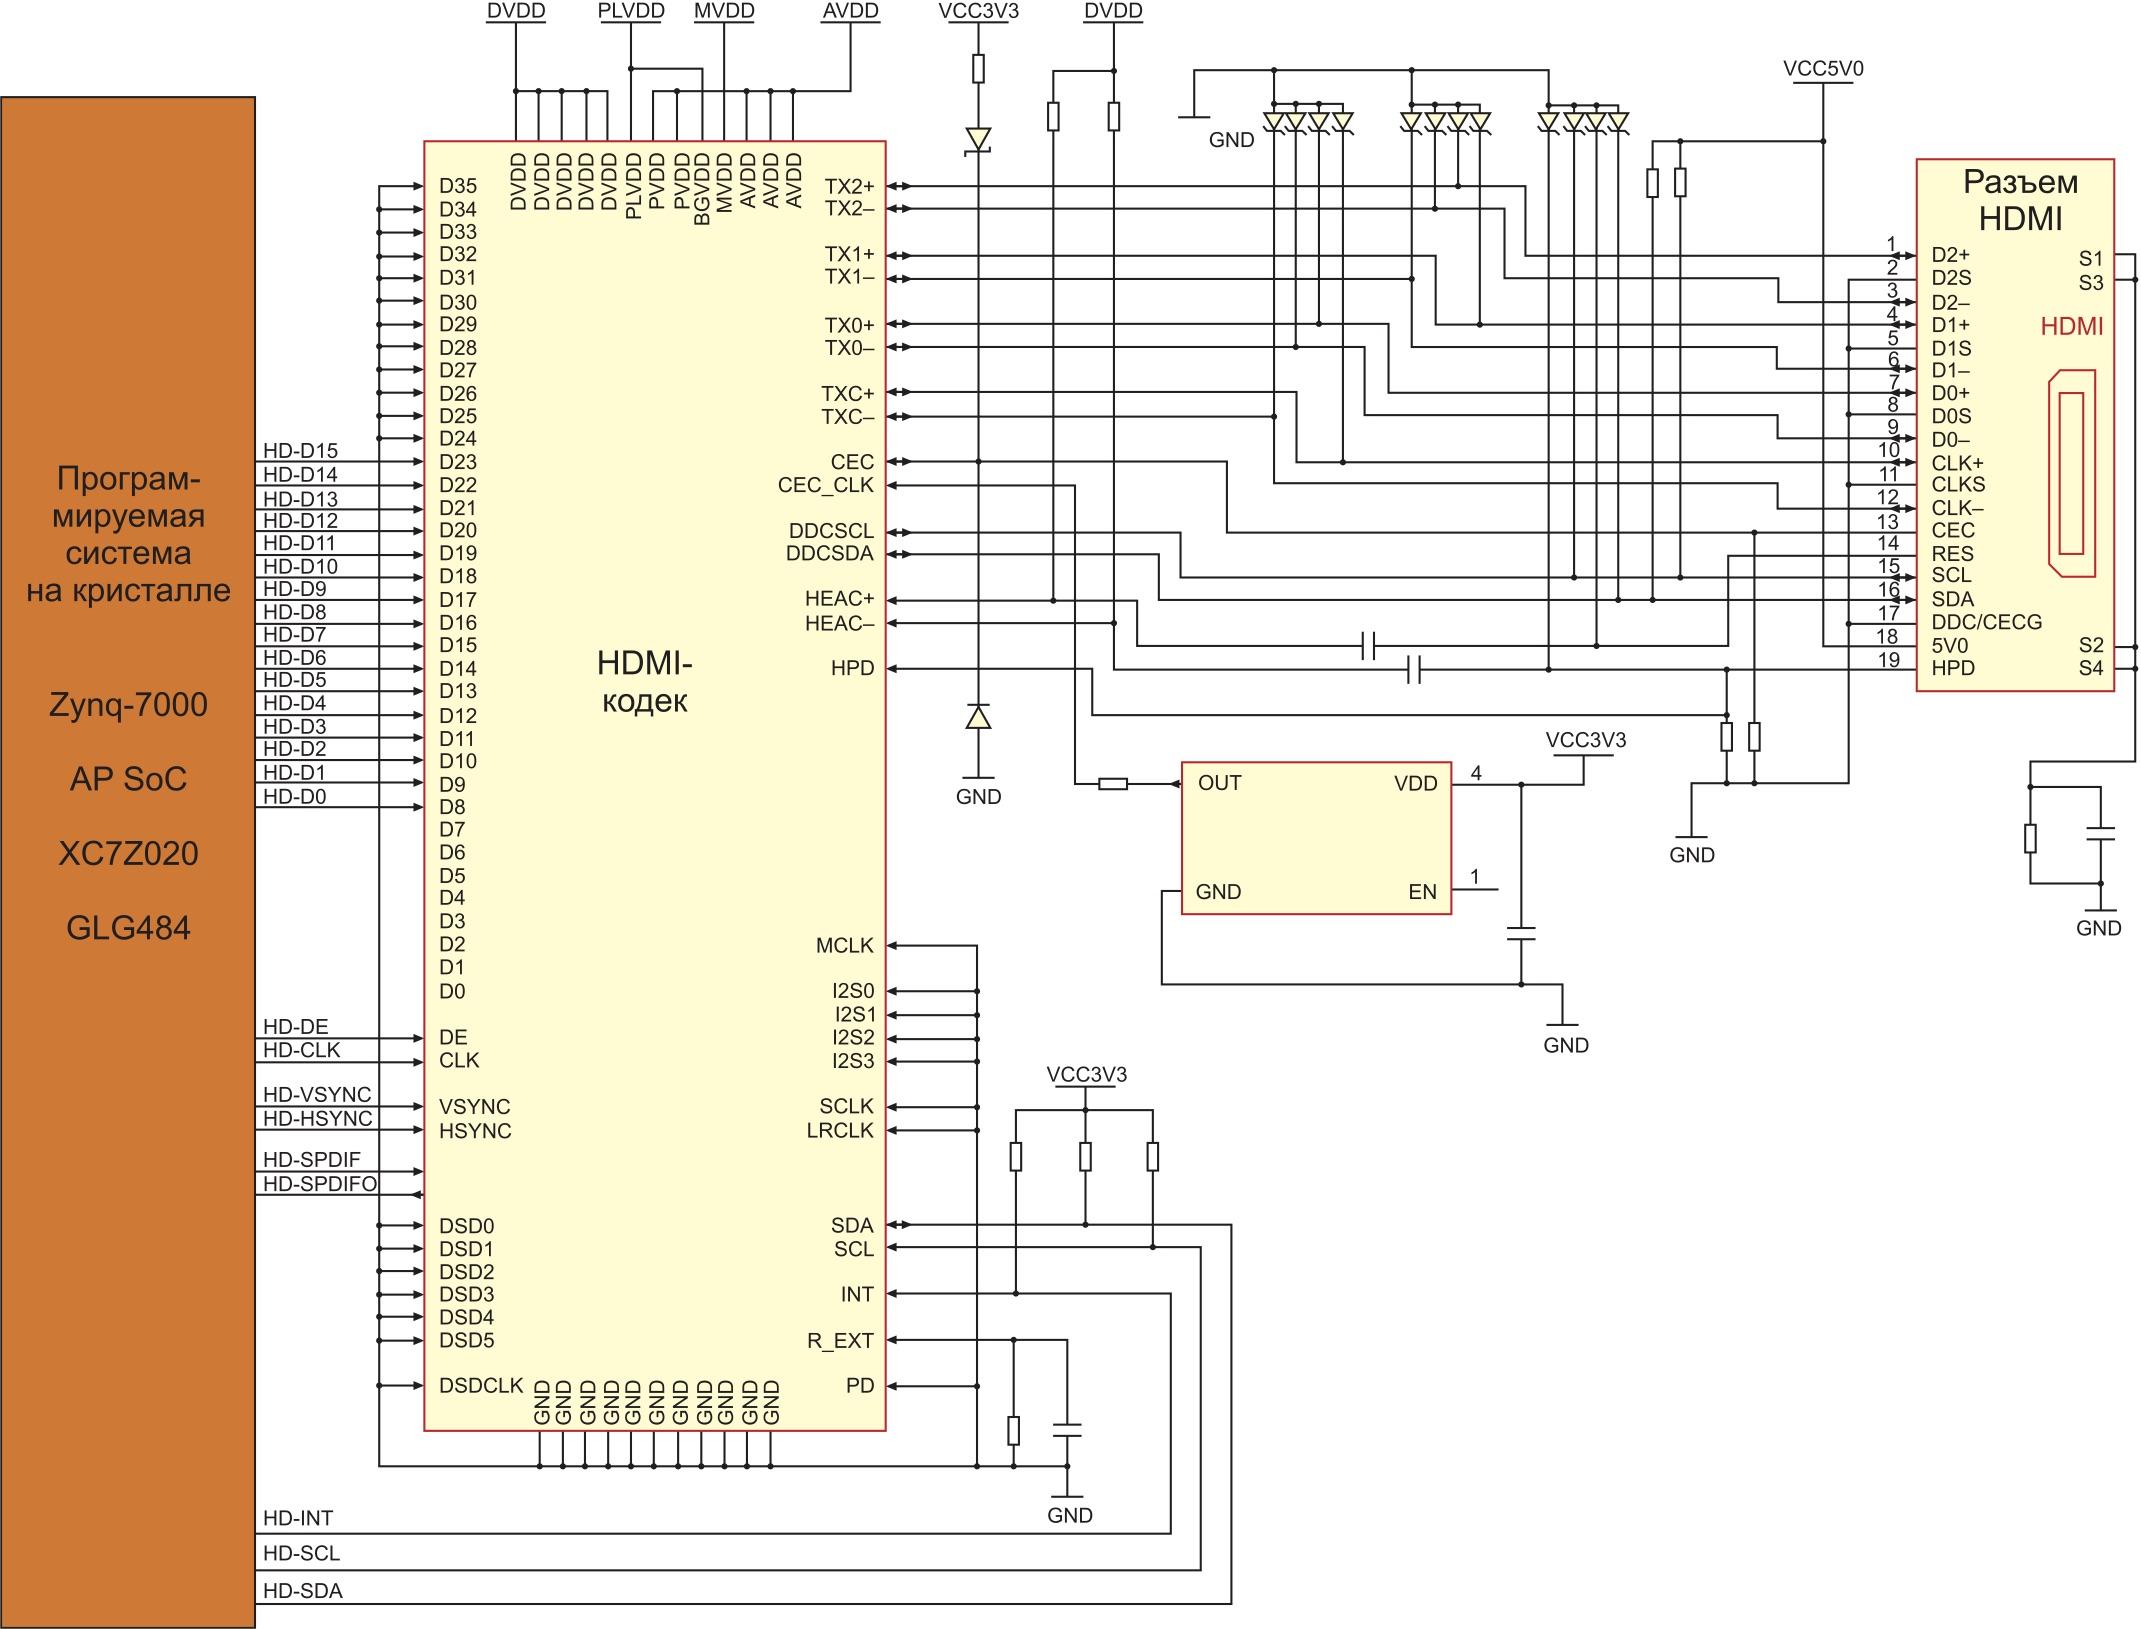 Схема подключения HDMI-кодека к кристаллу XC7Z020 в отладочном модуле ZedBoard